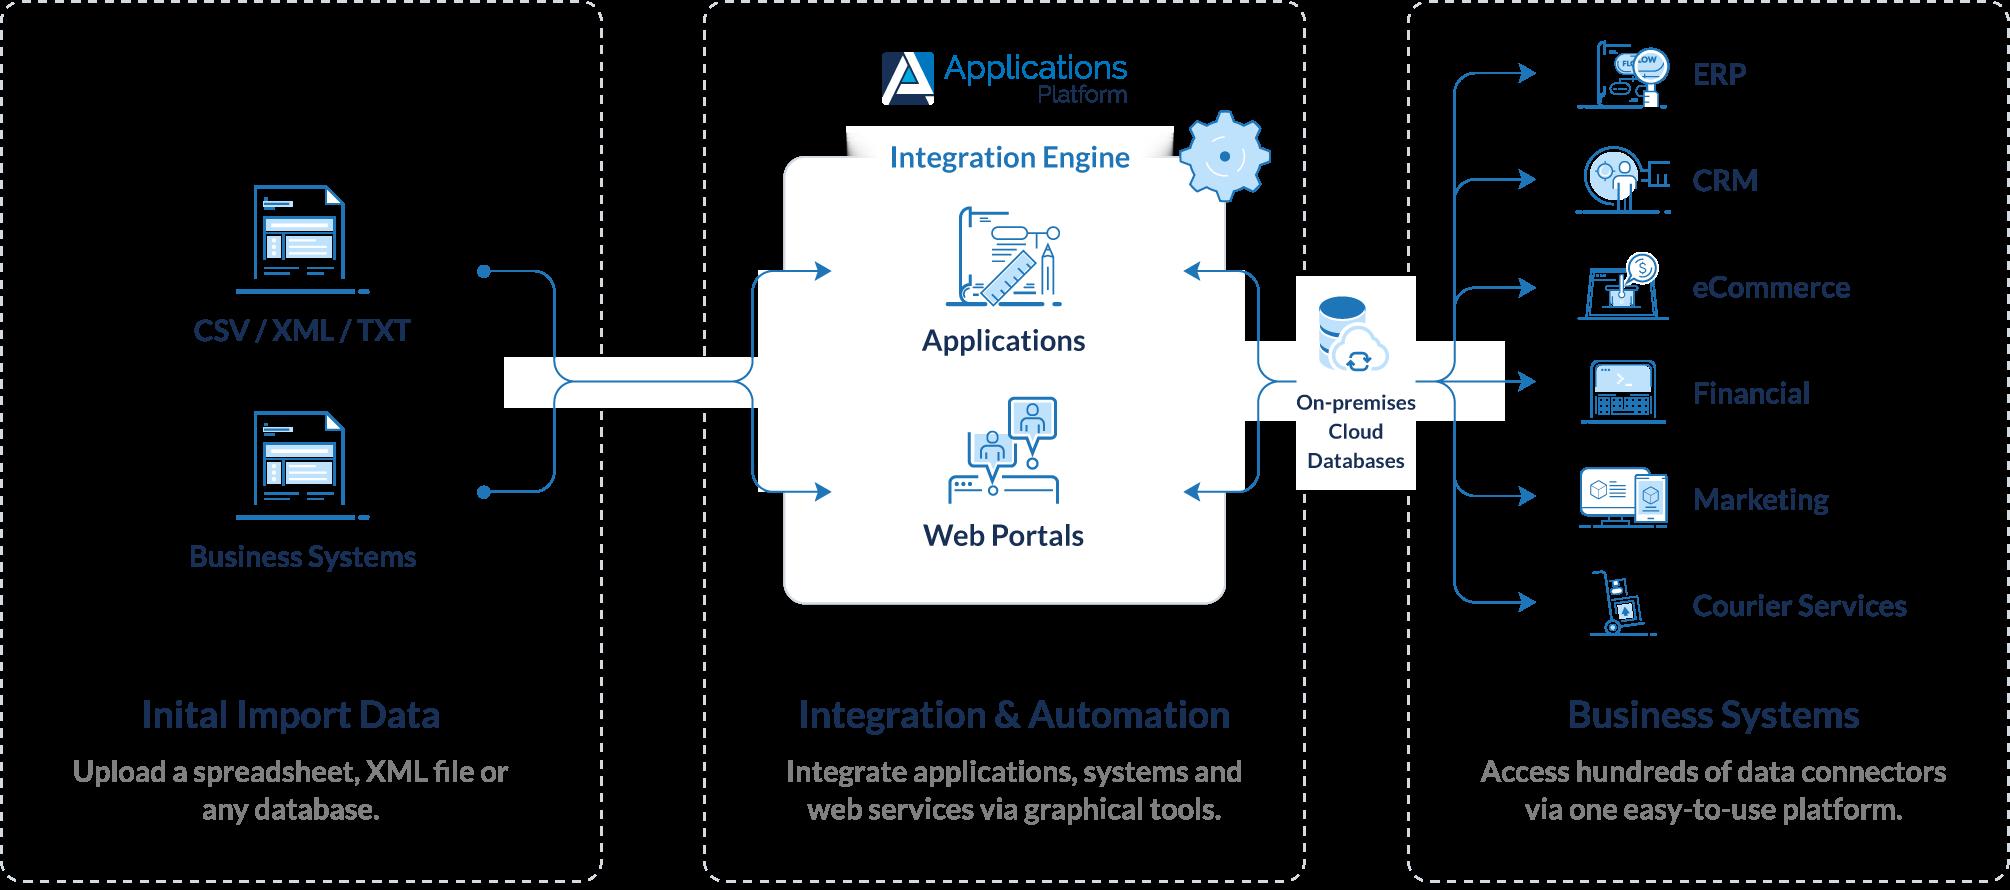 Integration Engine